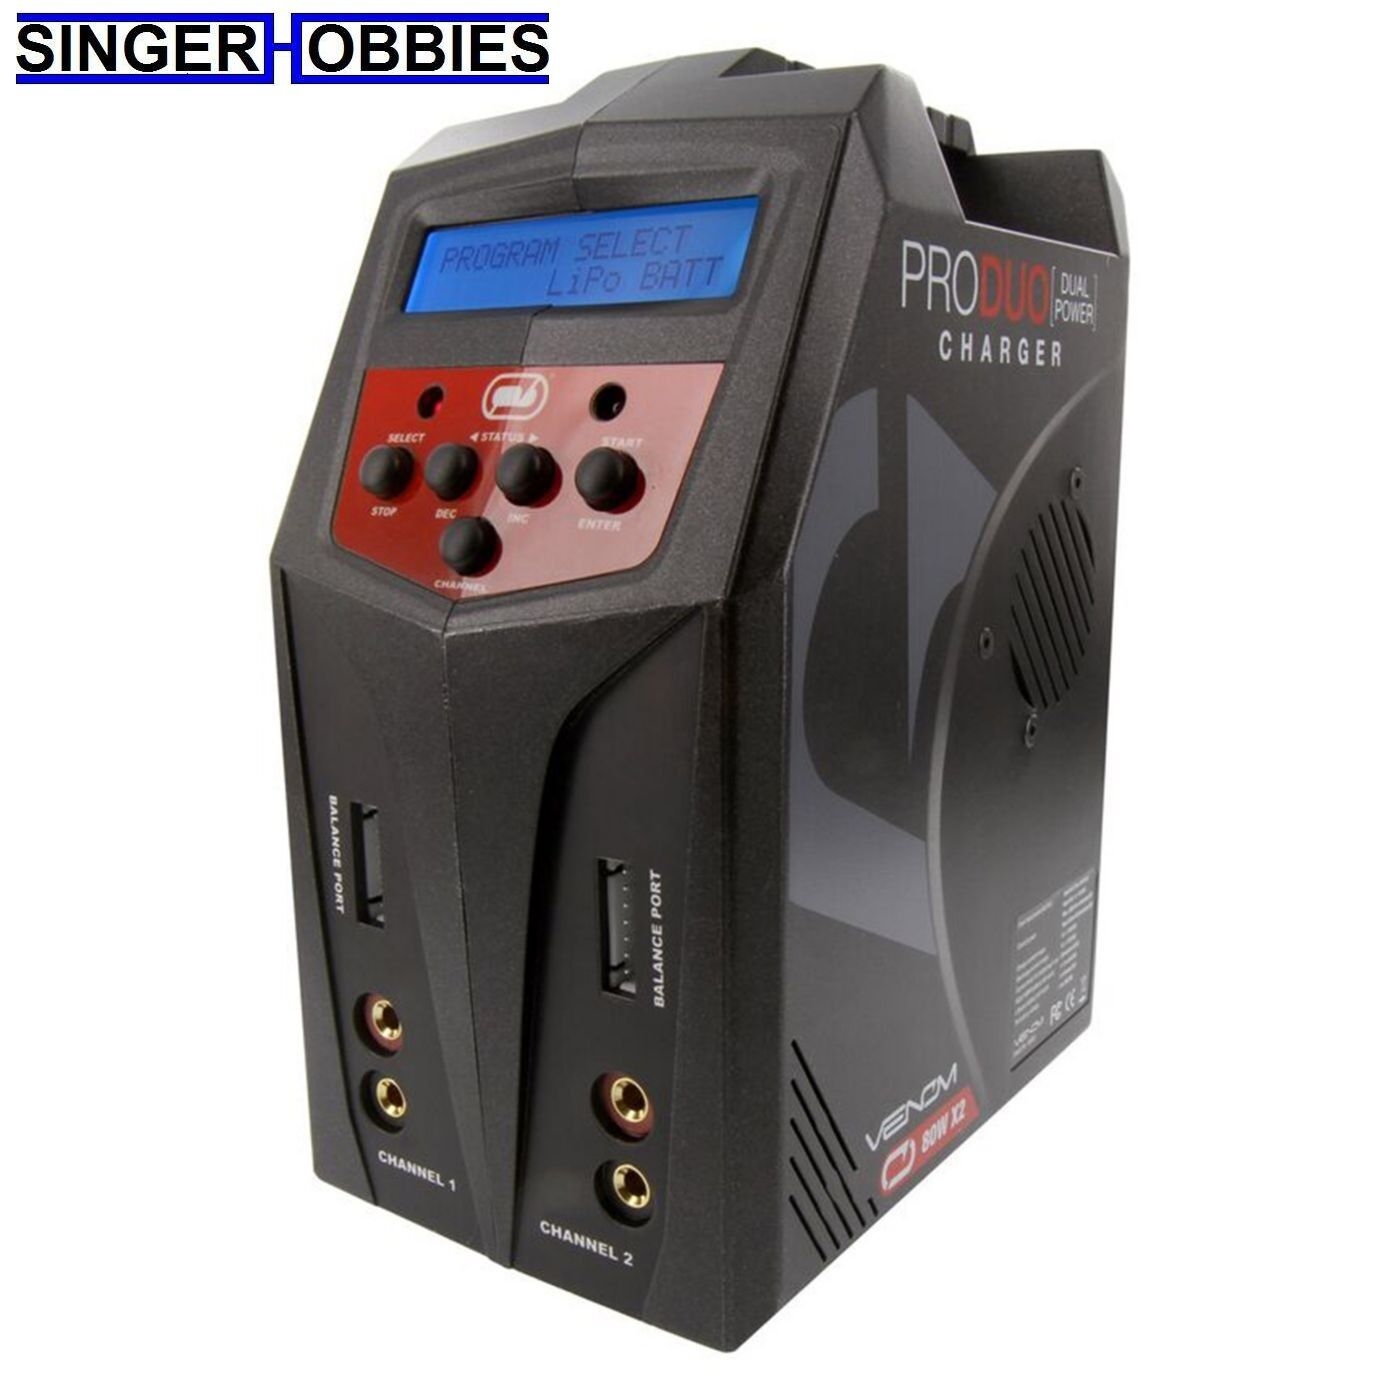 Venom Pro 160W Duo AC DC LiPo & NiMH Battery Charger VNR0685 HH